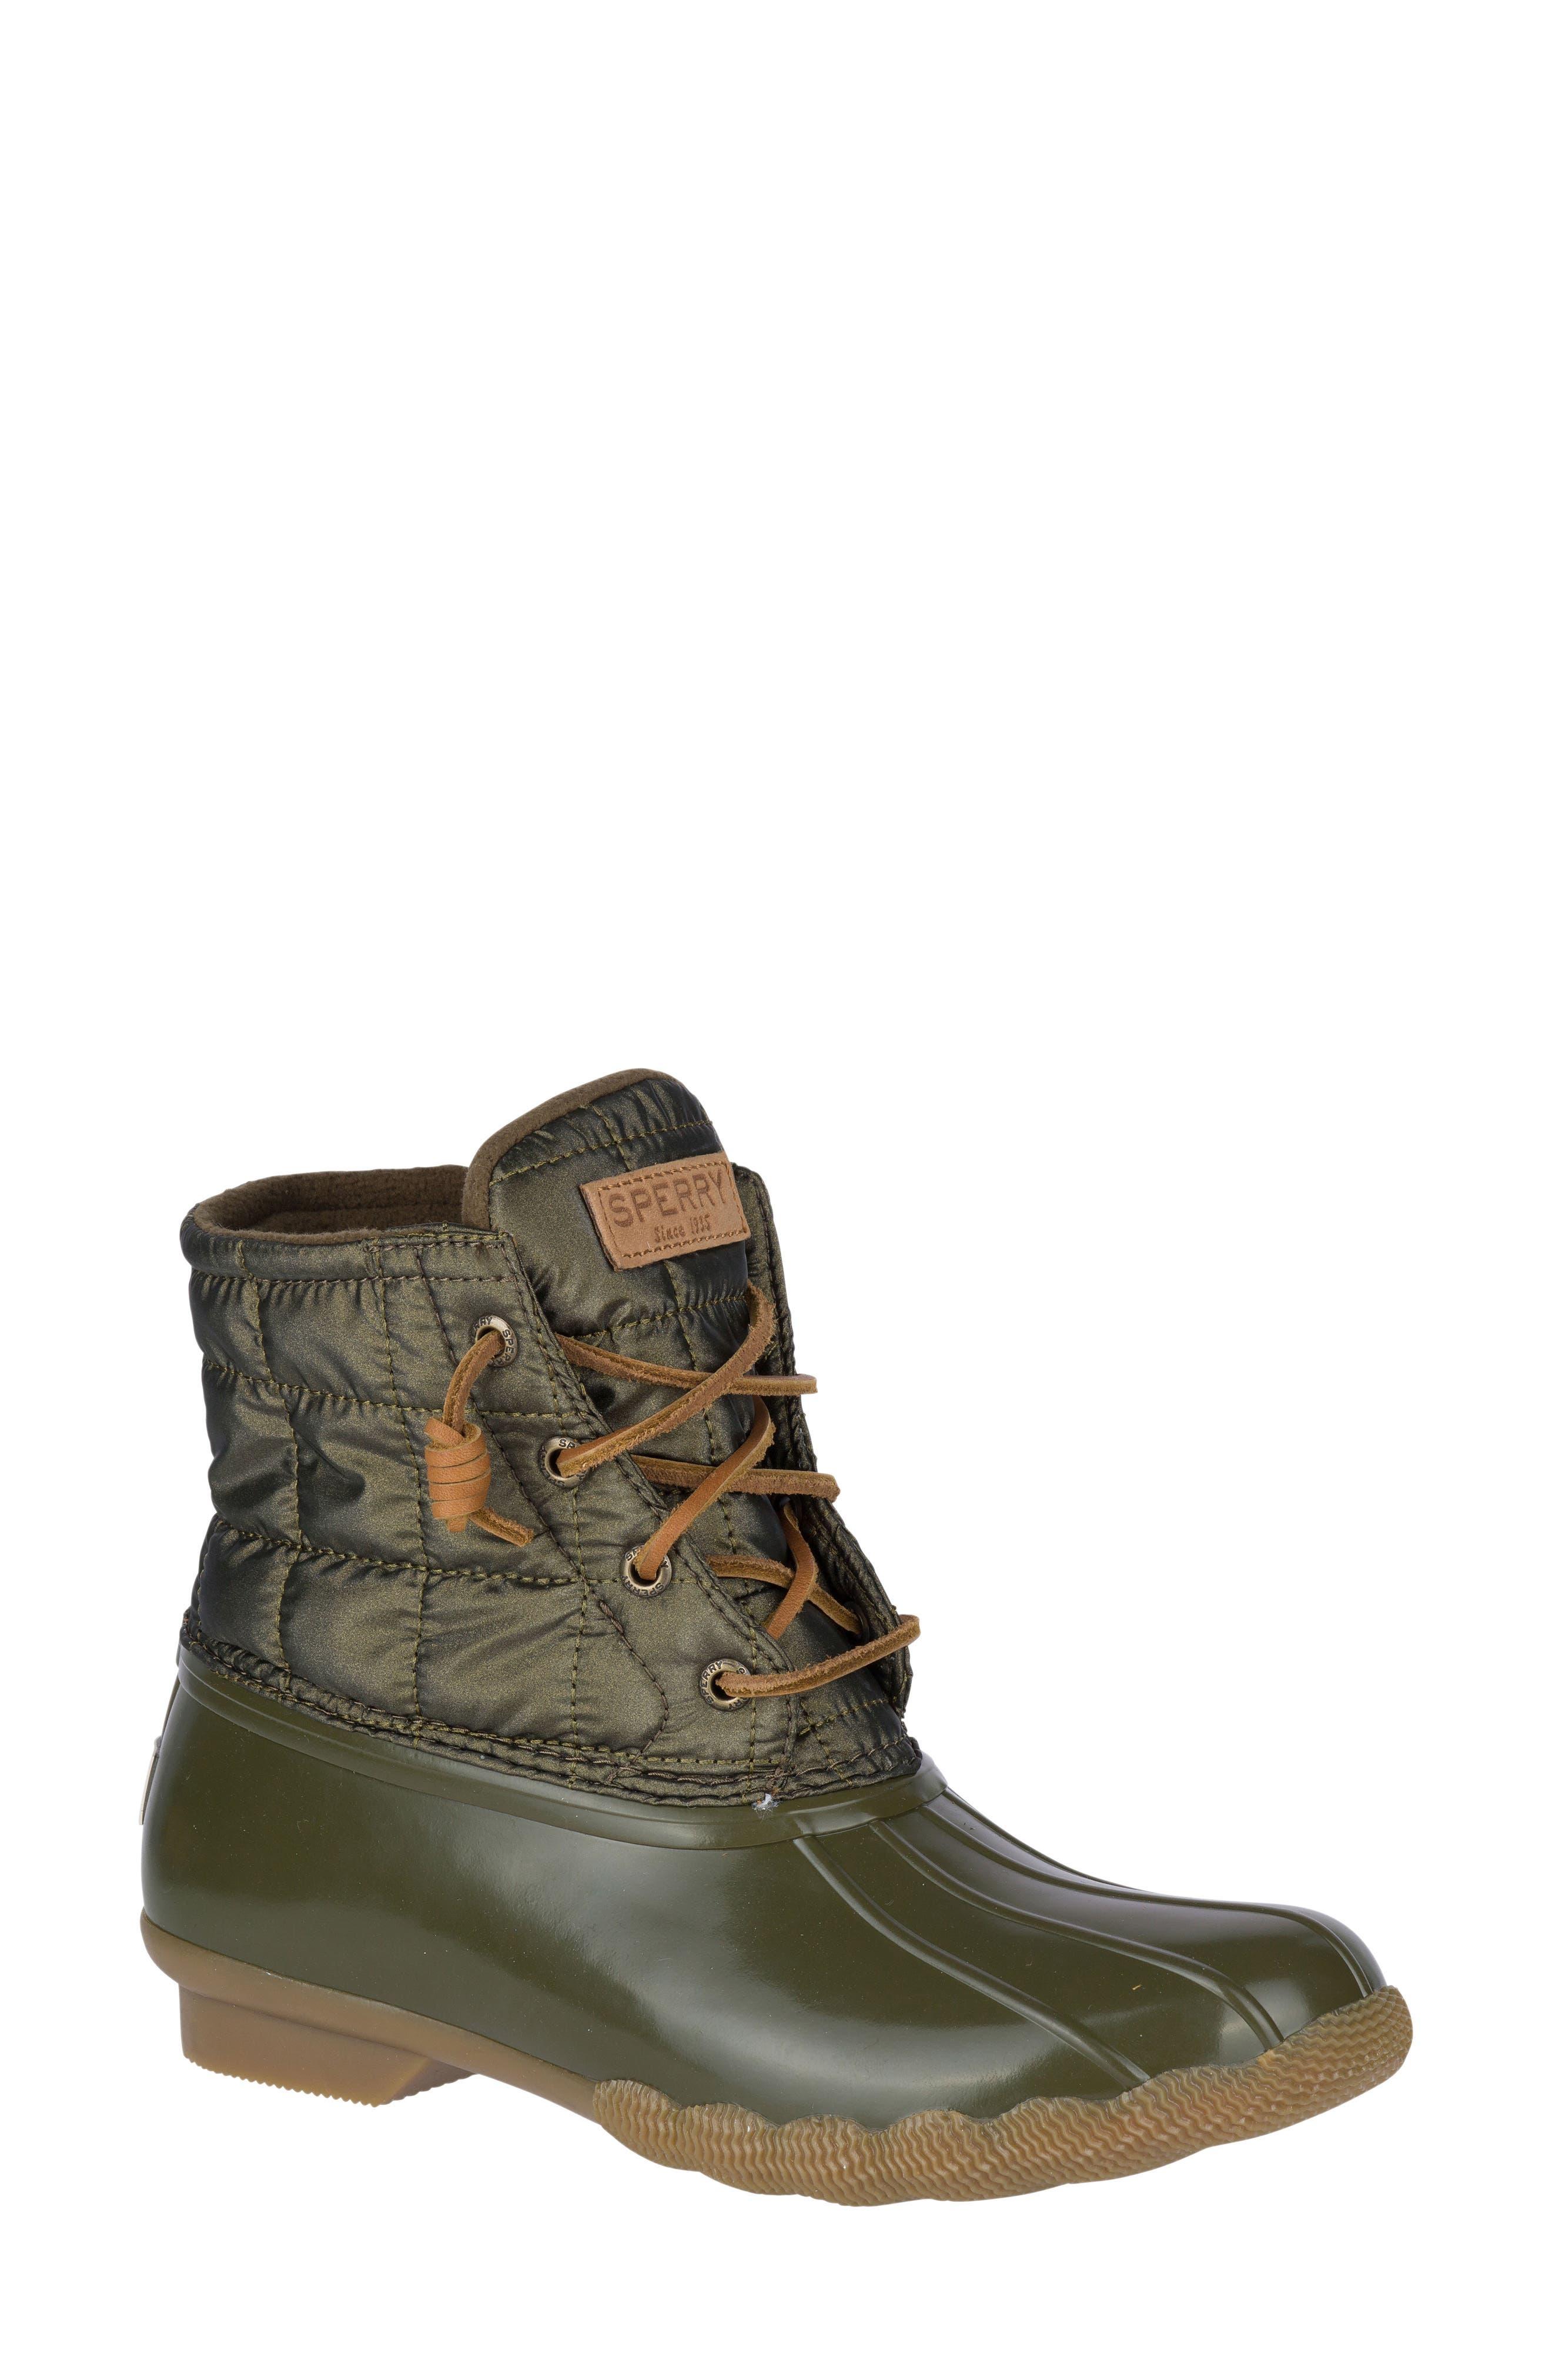 Sperry Green Rain \u0026 Winter Boots